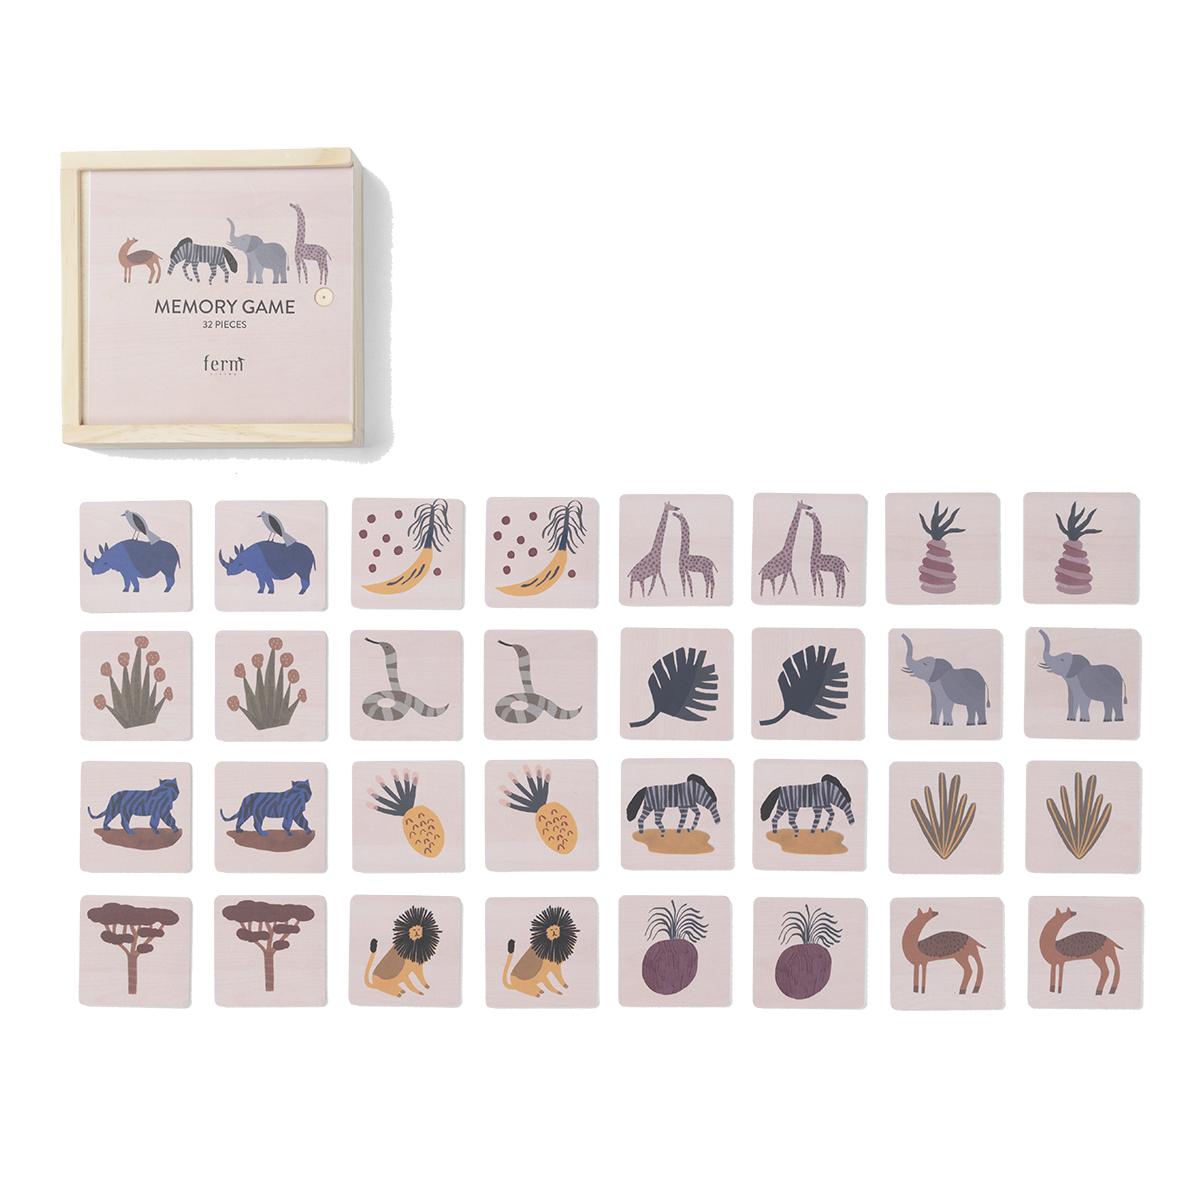 Mes premiers jouets Memory Game - Safary Memory Game - Safary